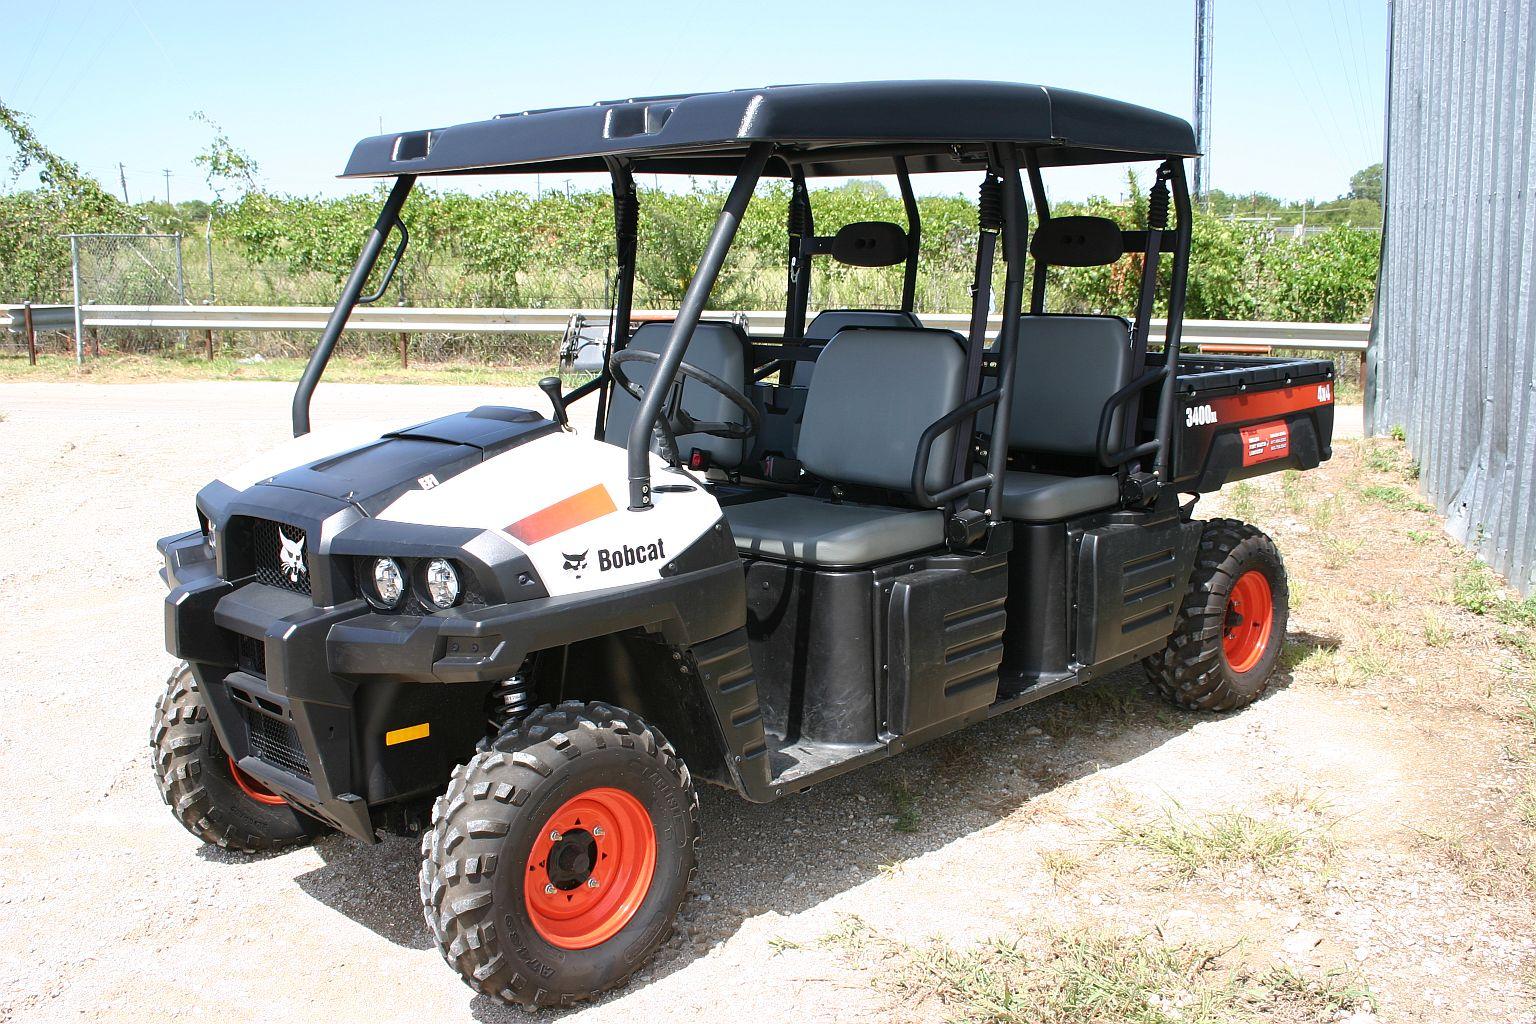 6 Seat 4WD Utility Vehicle